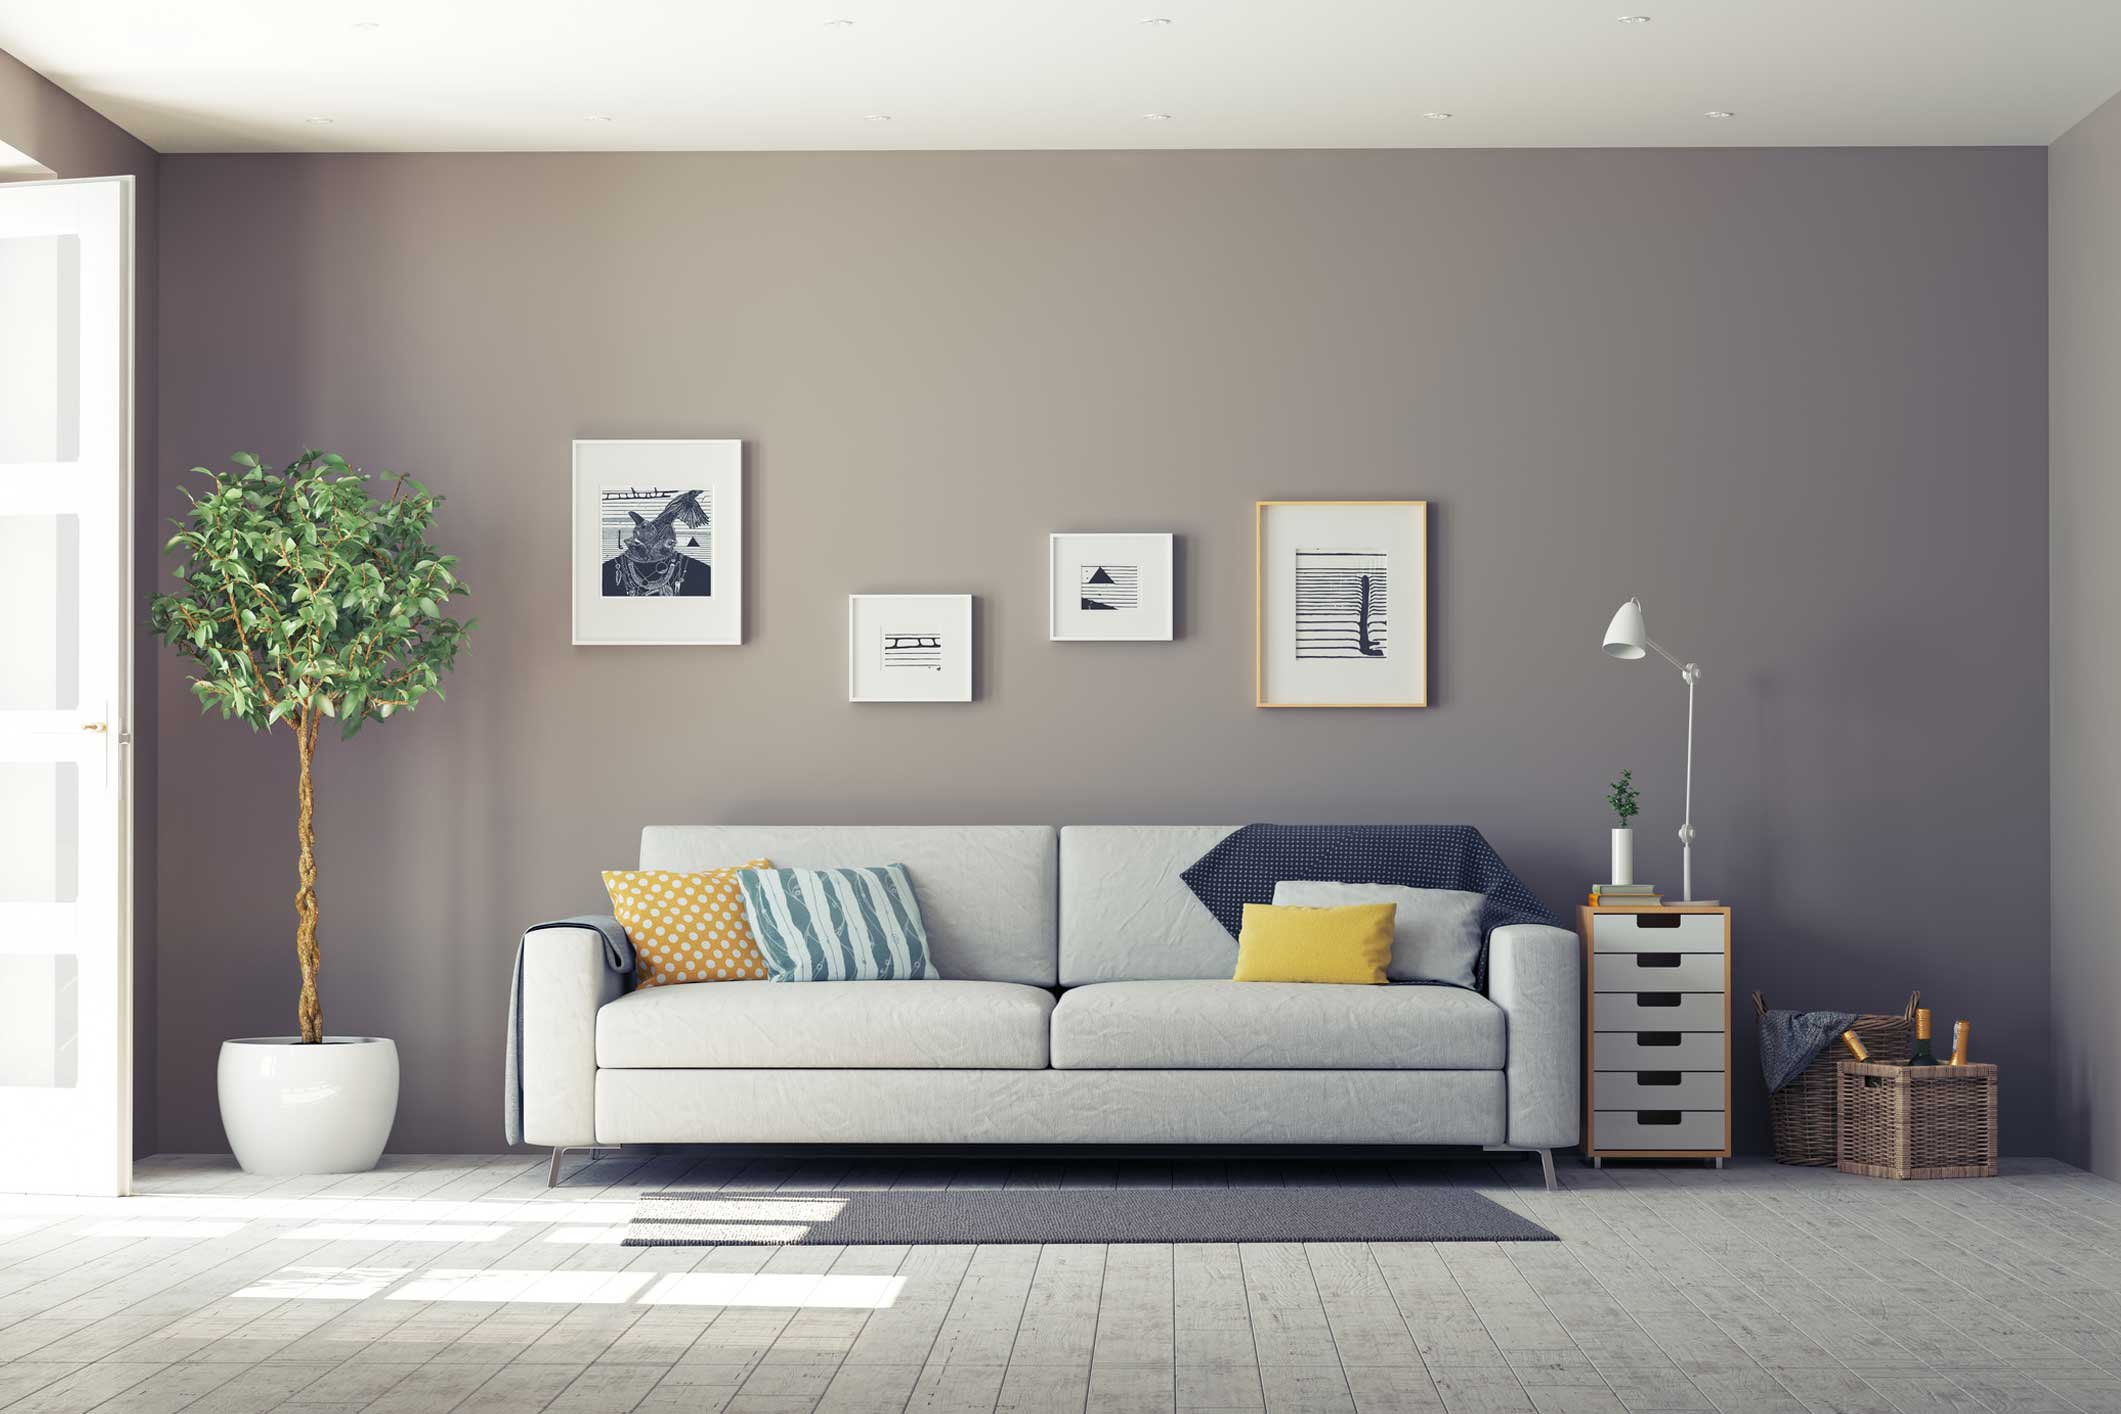 Pittura parete interna